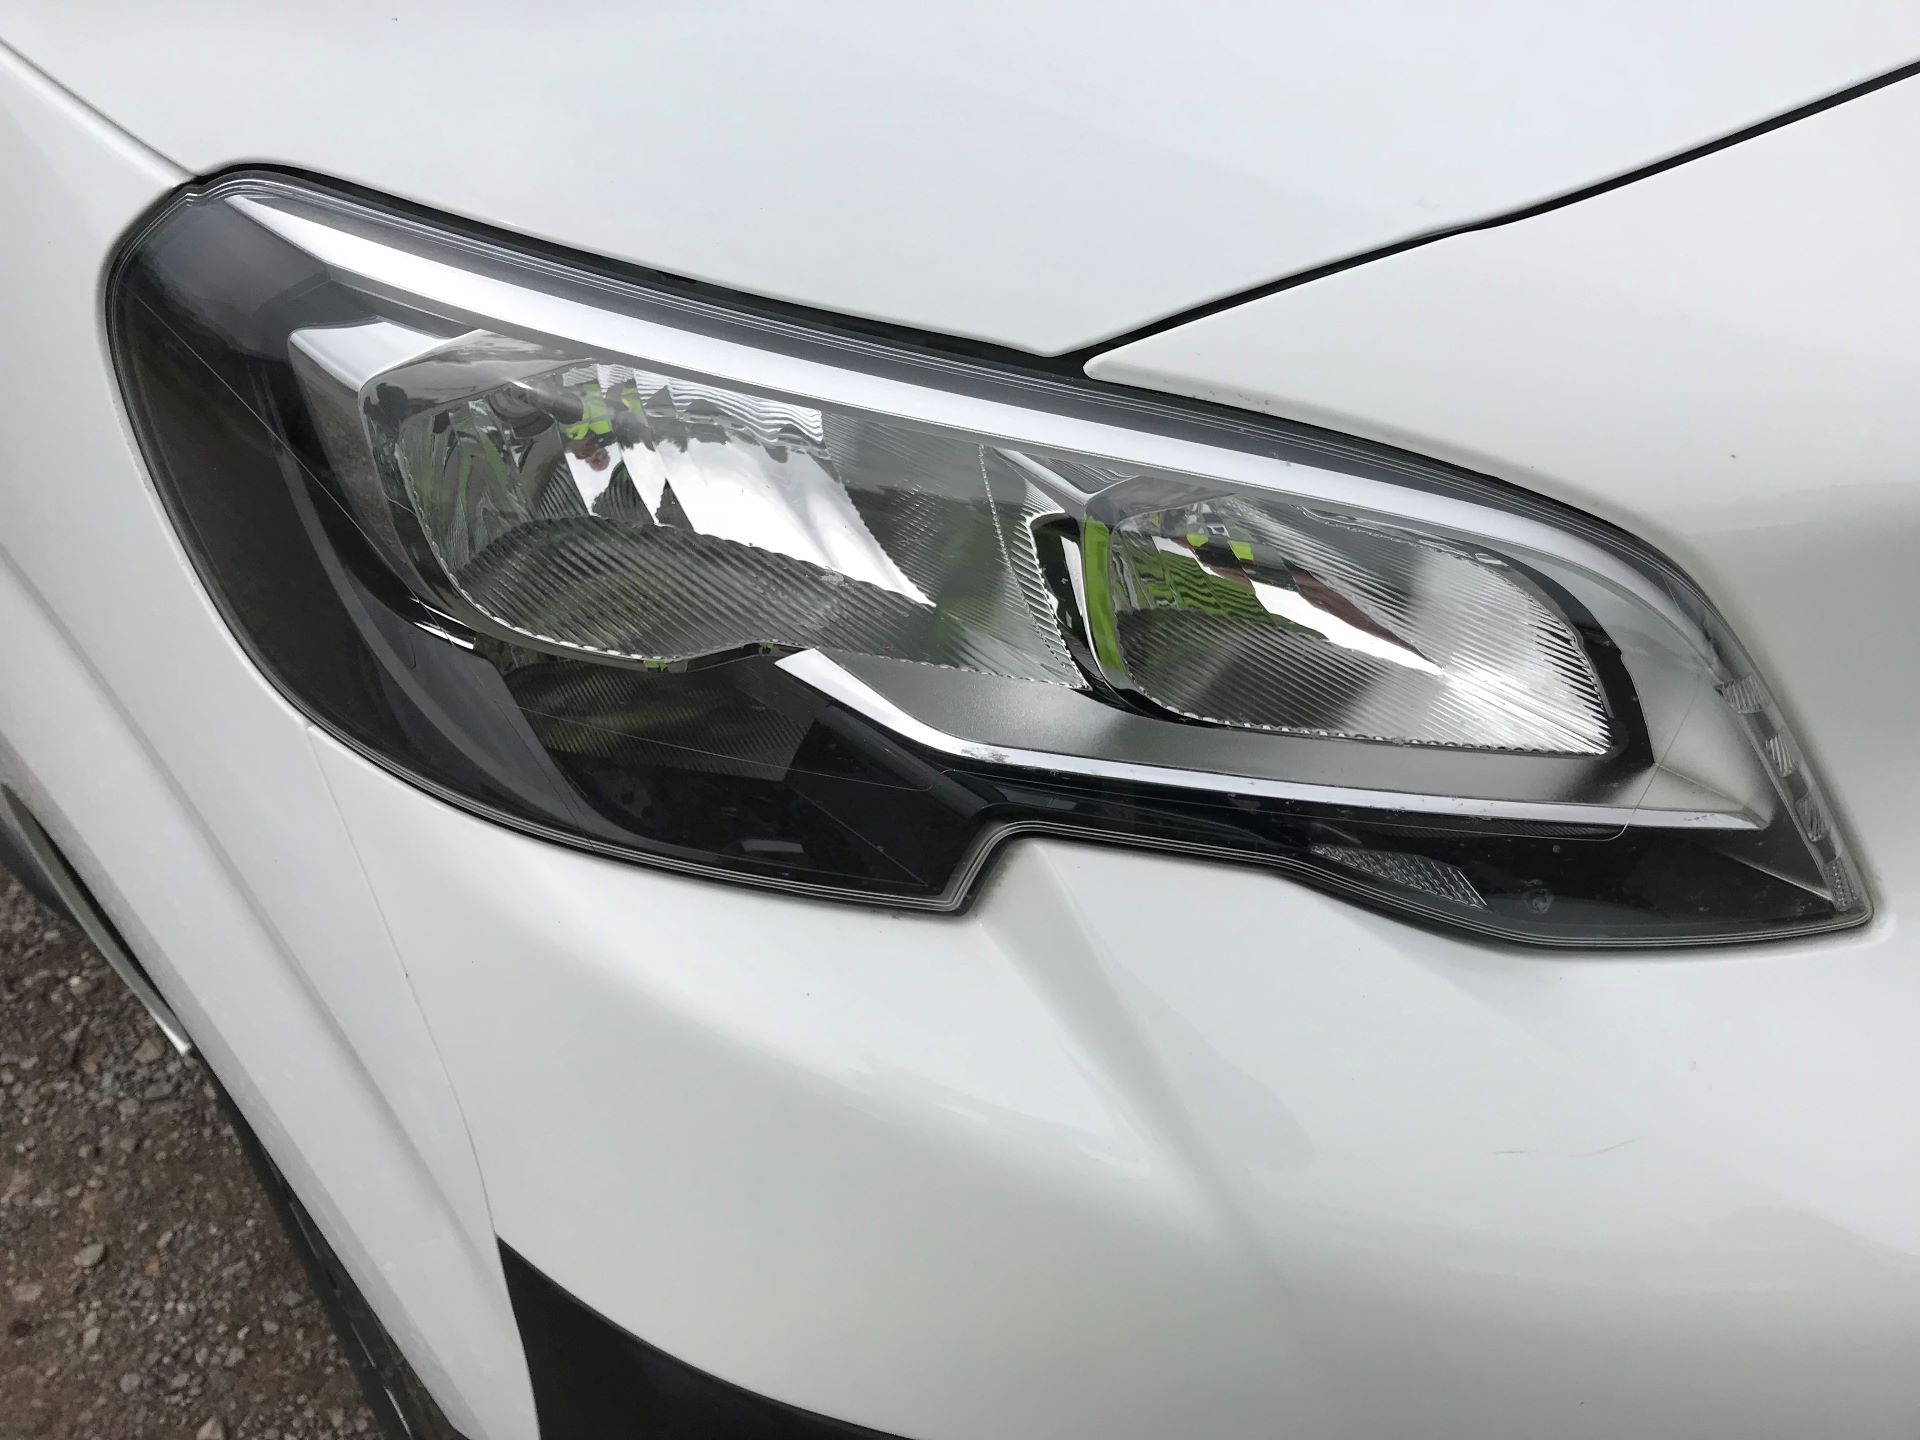 2018 Peugeot Expert STANDARD 1000 1.6 BLUEHDI 95 PROFESSIONAL EURO 6 (NU18PFO) Image 27